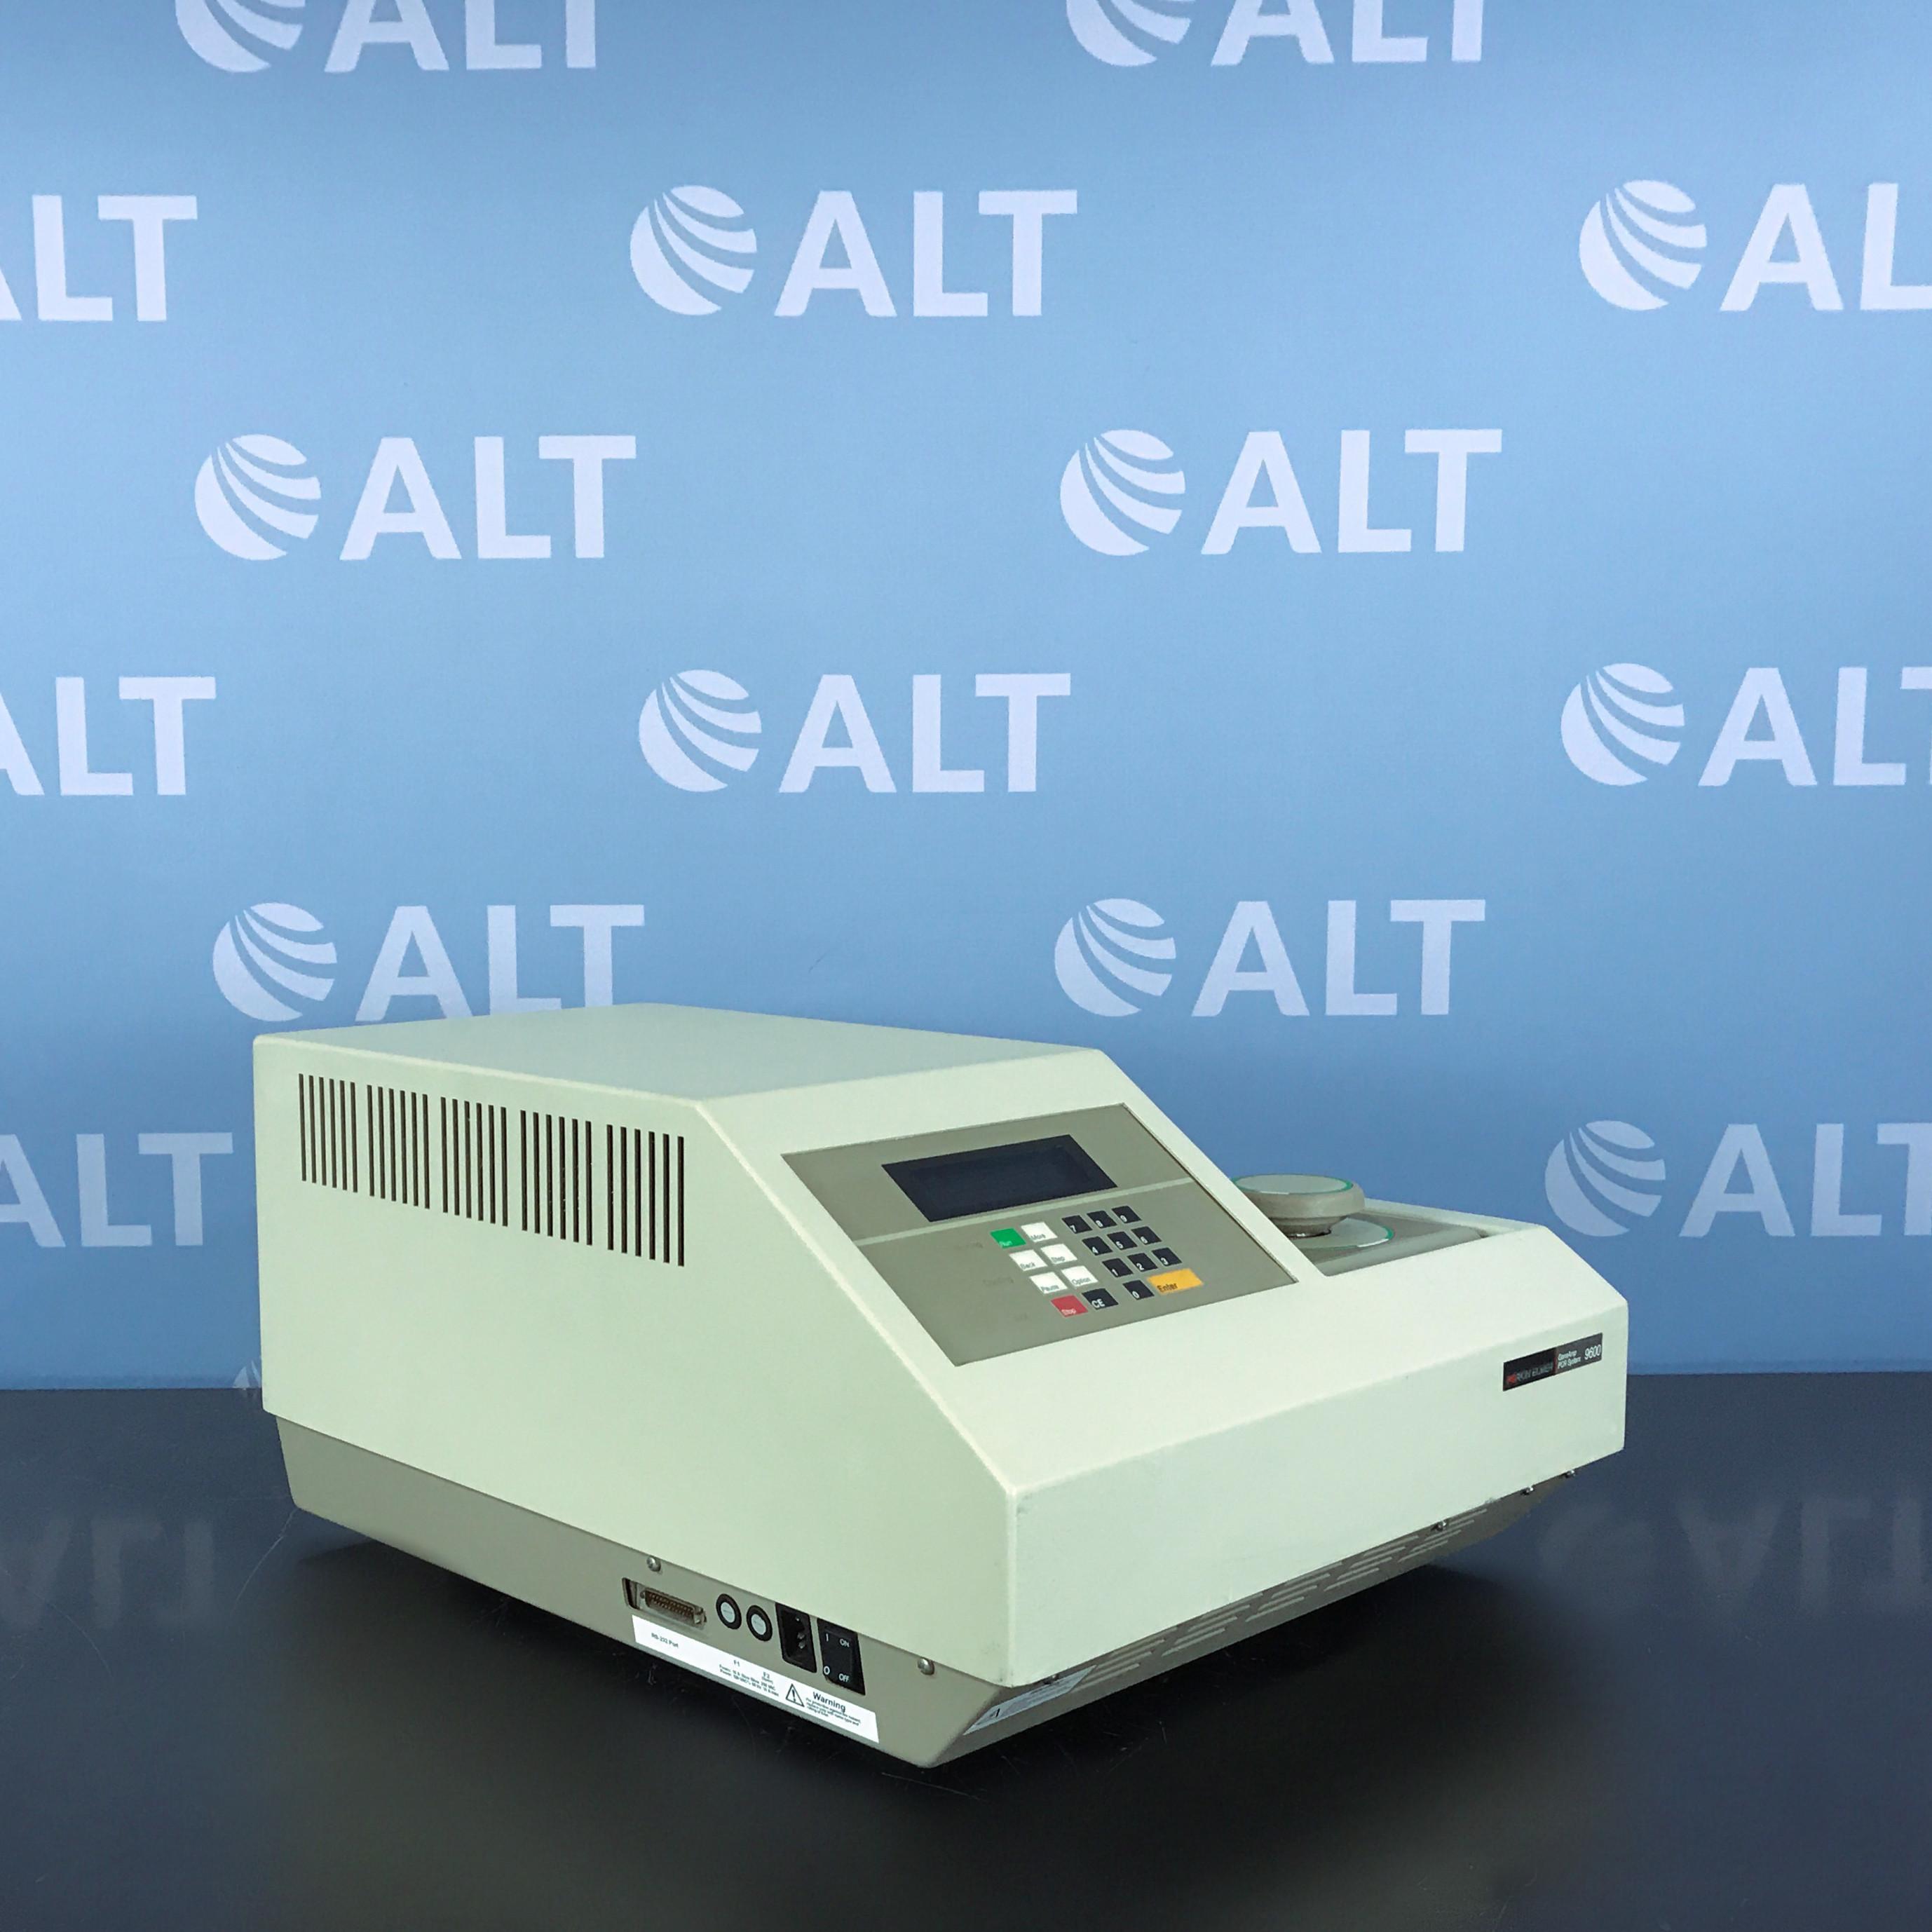 Perkin Elmer GeneAmp PCR System 9600 Image